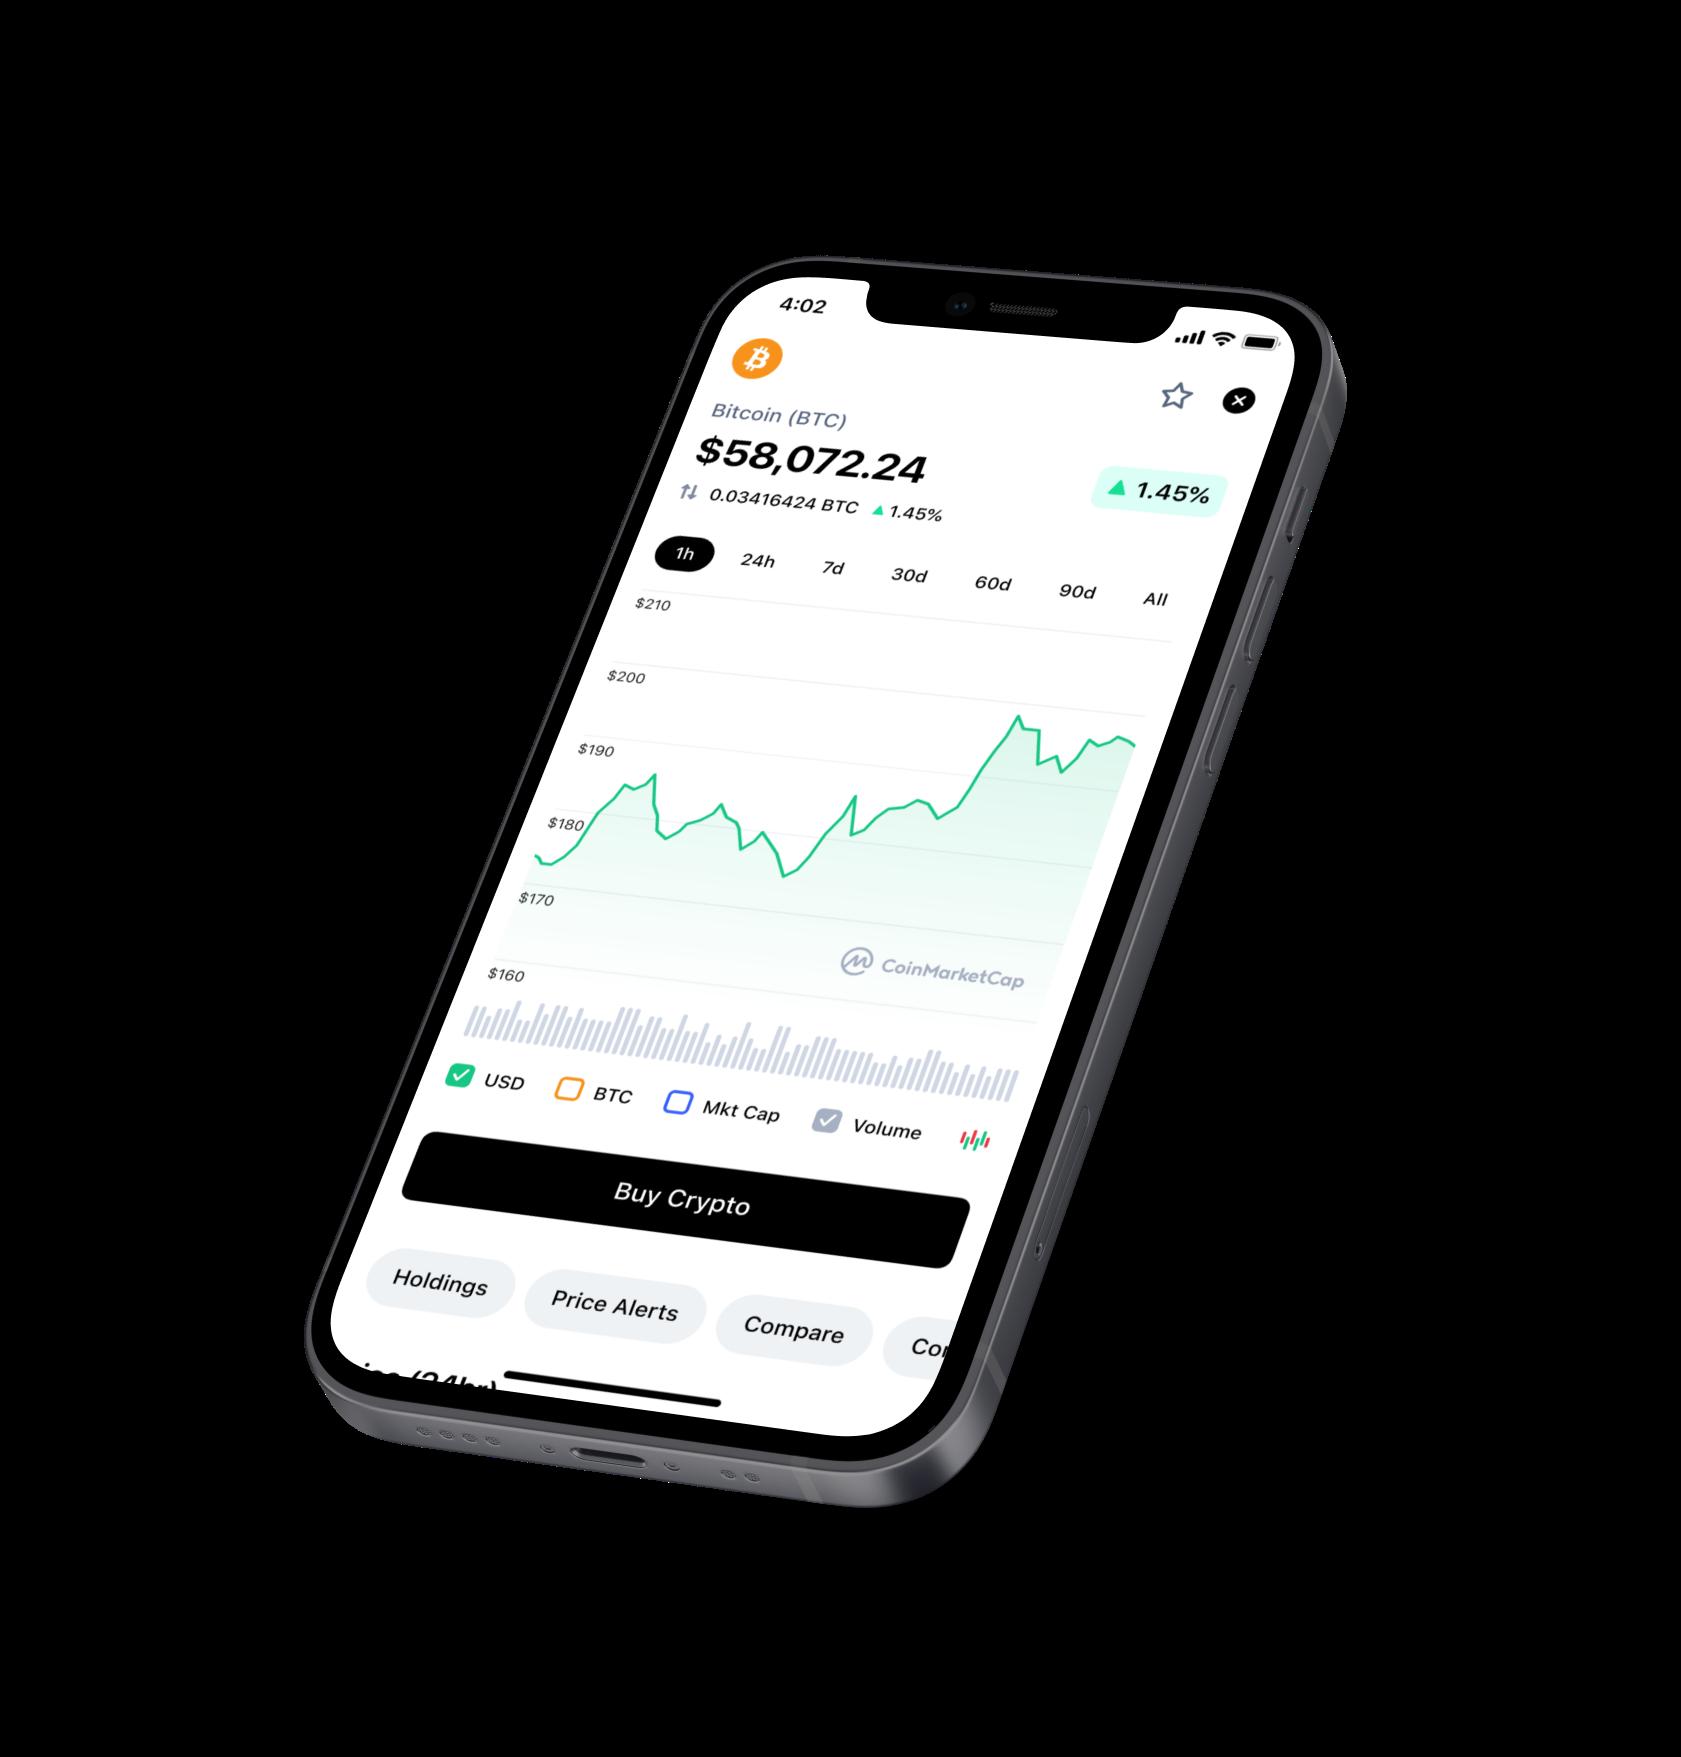 bitcoin market app iphone